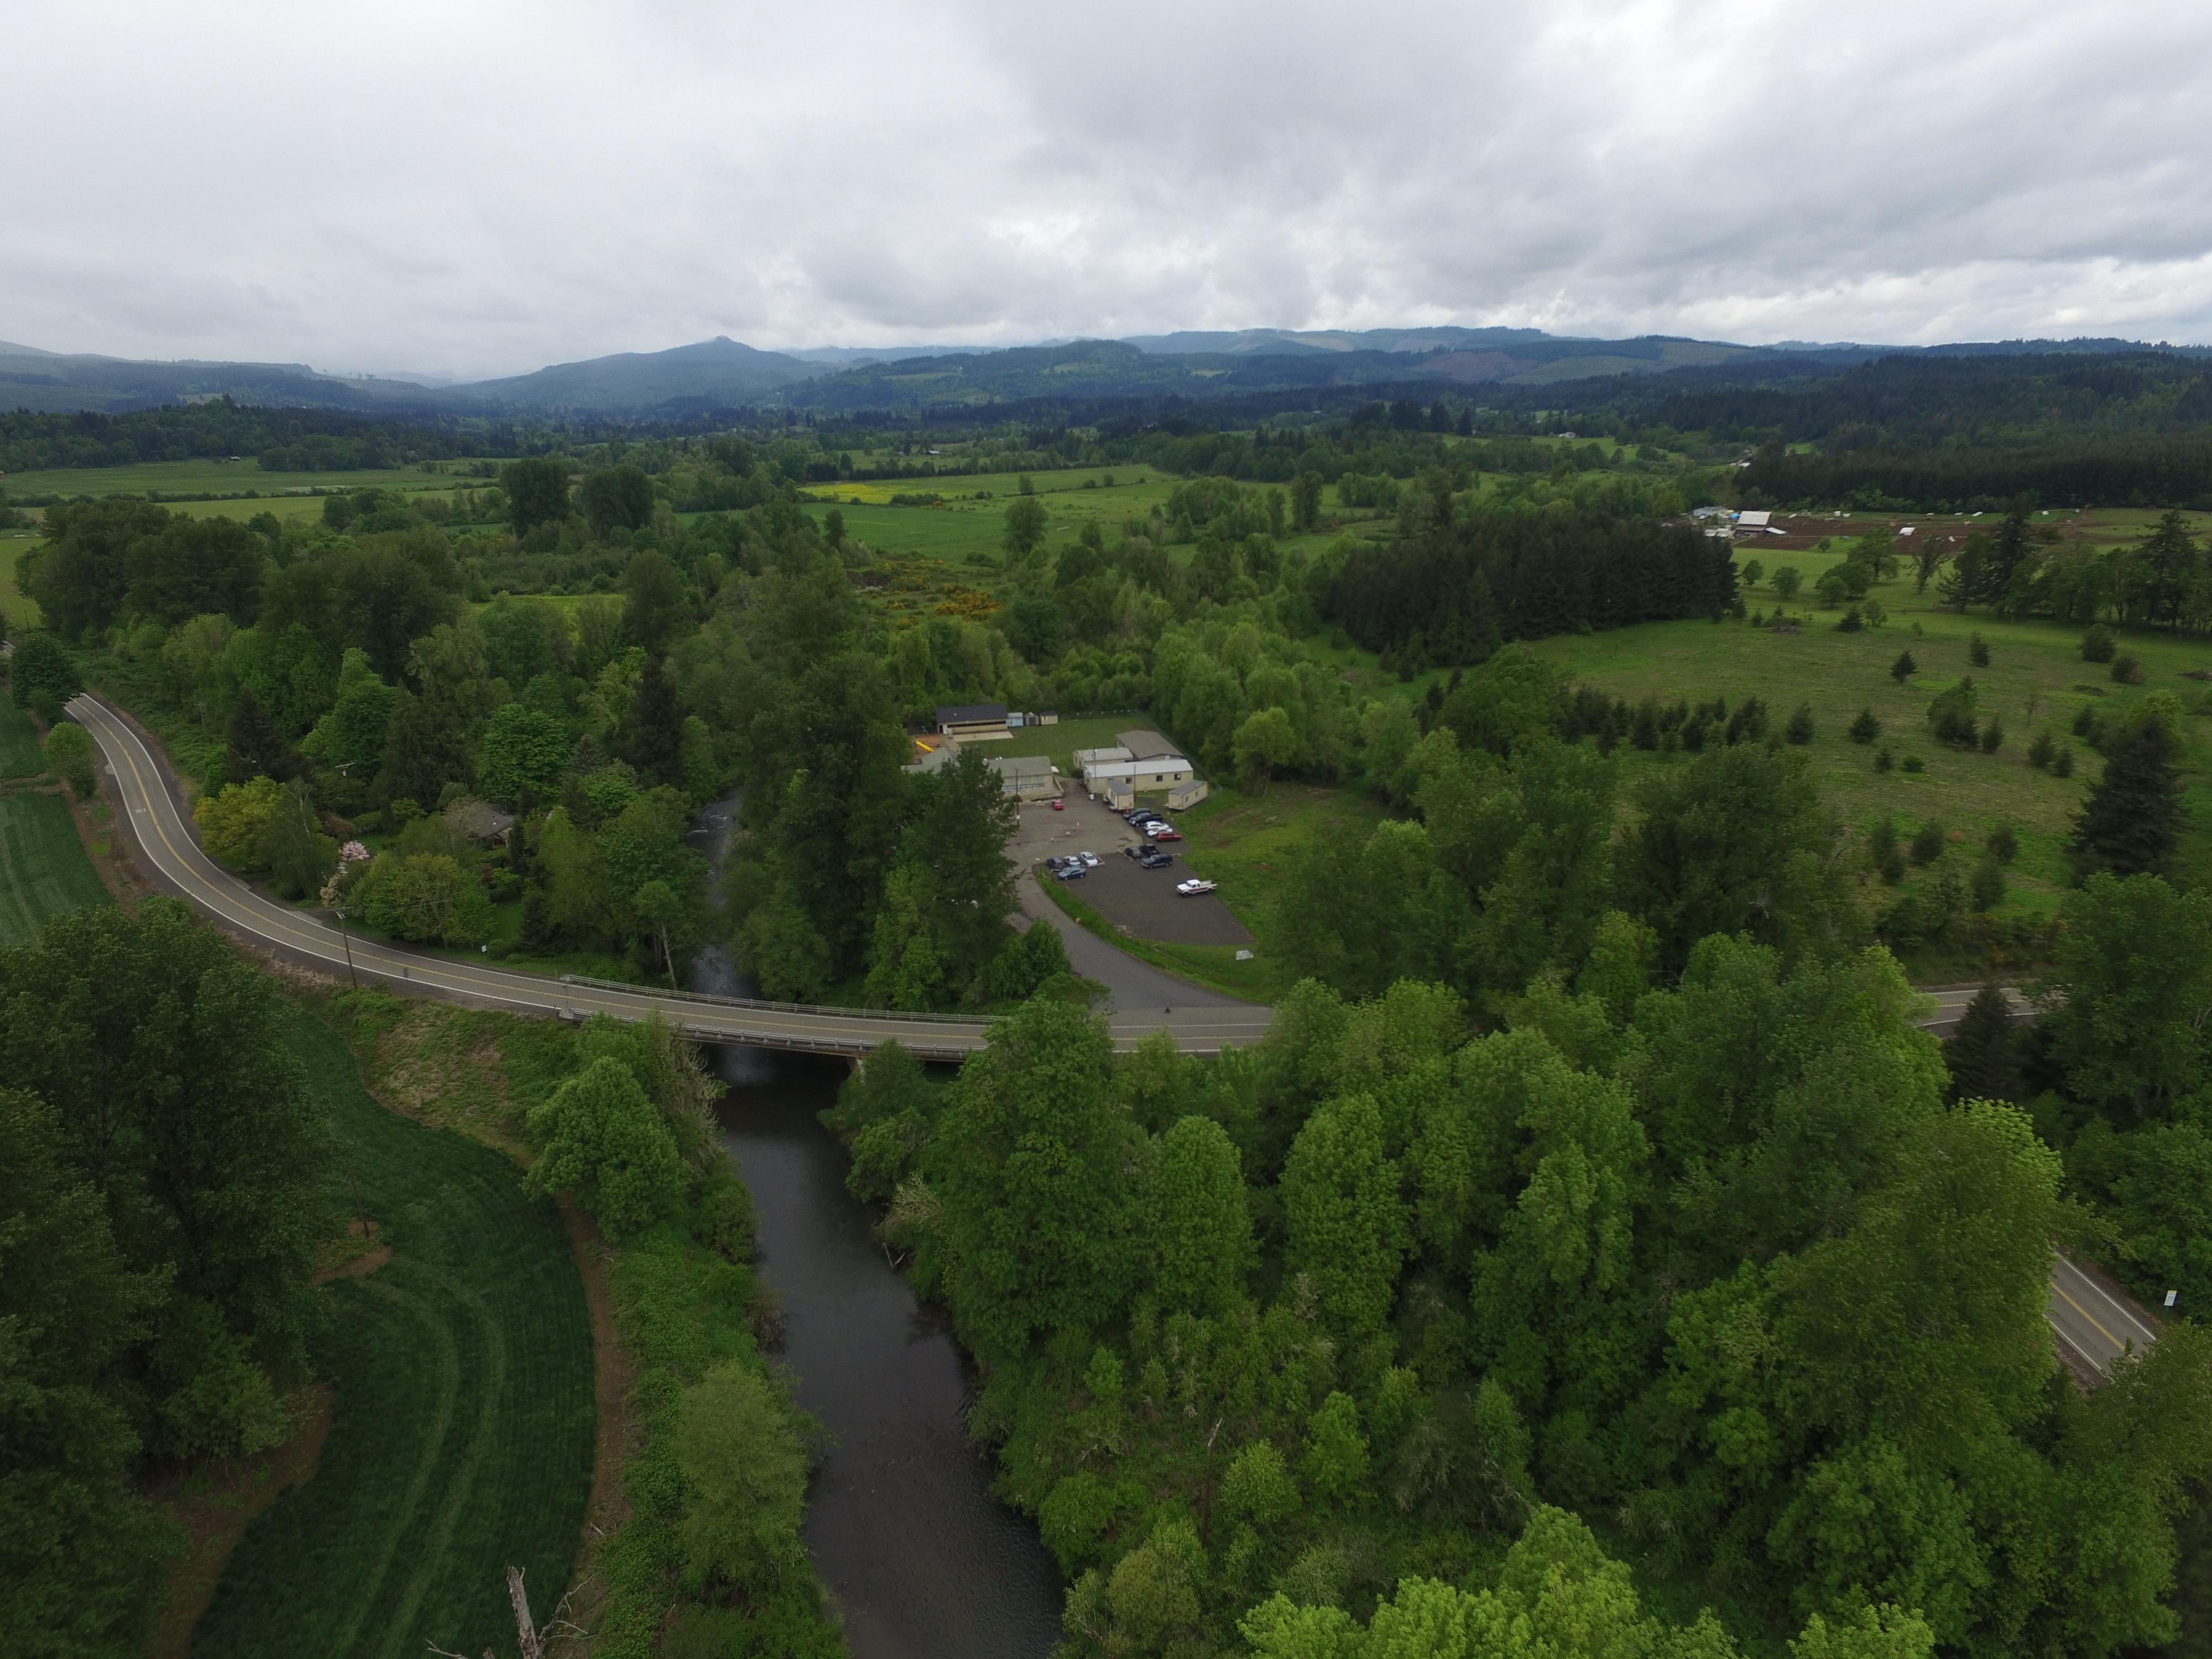 Aerial View of Bridgeport